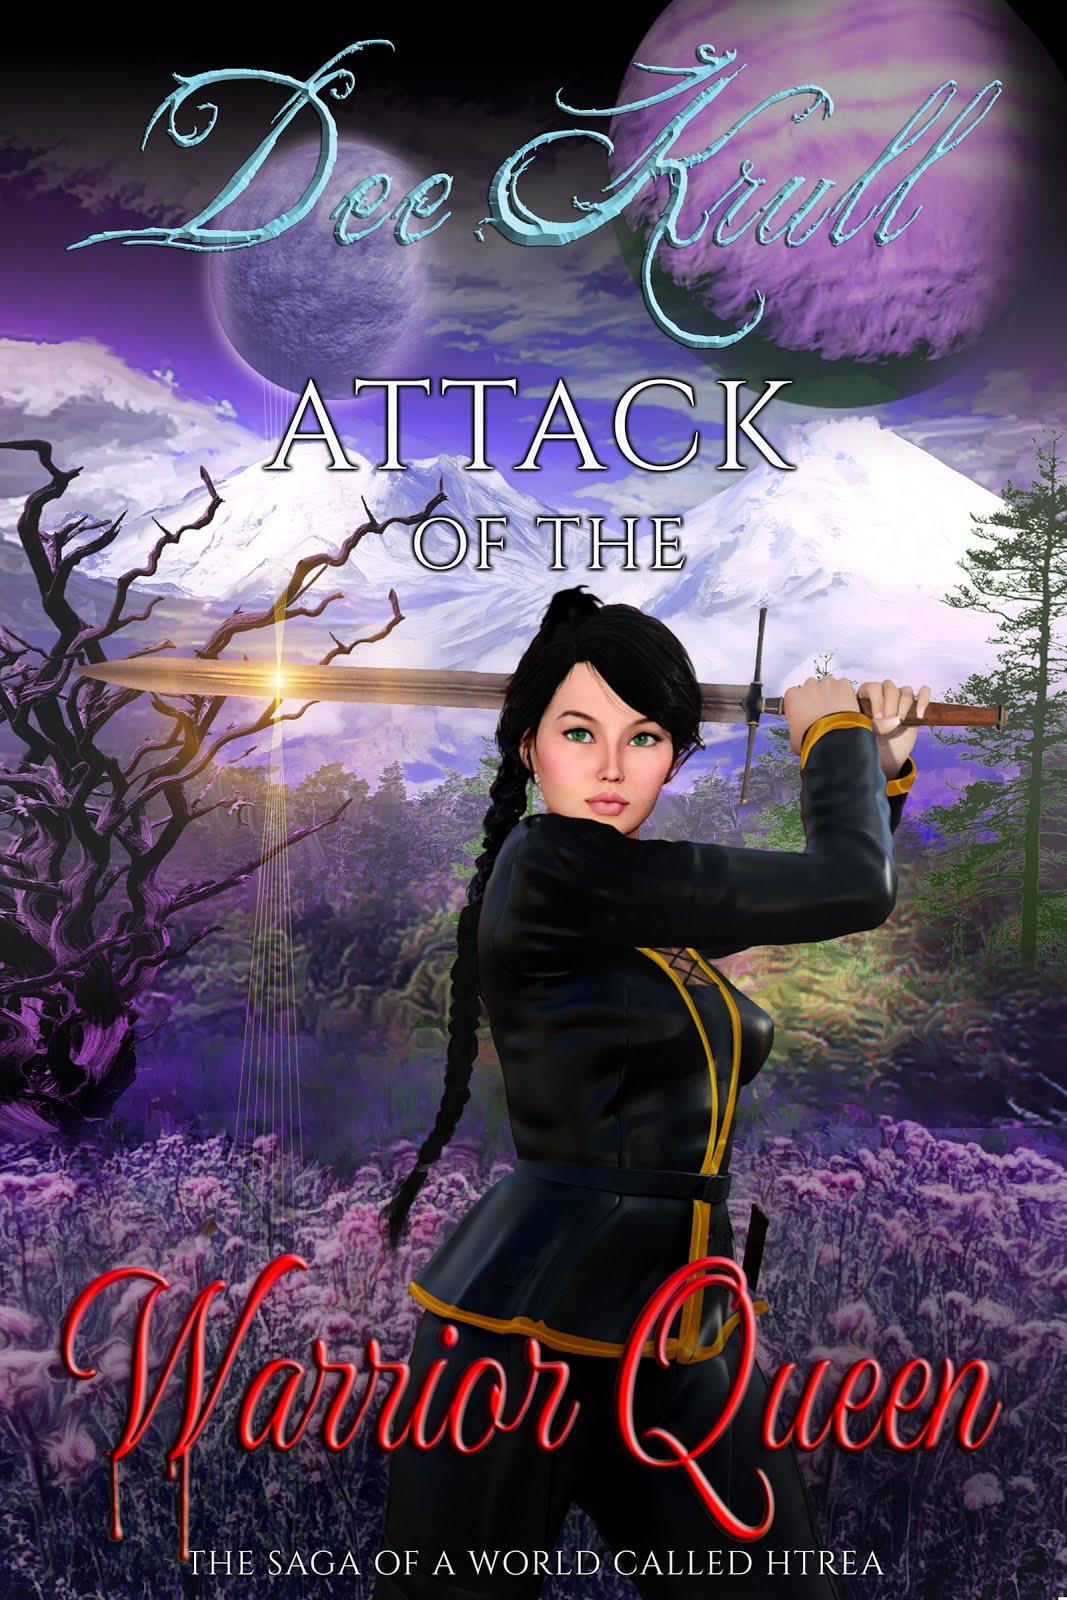 Attack of the Warrior Queen